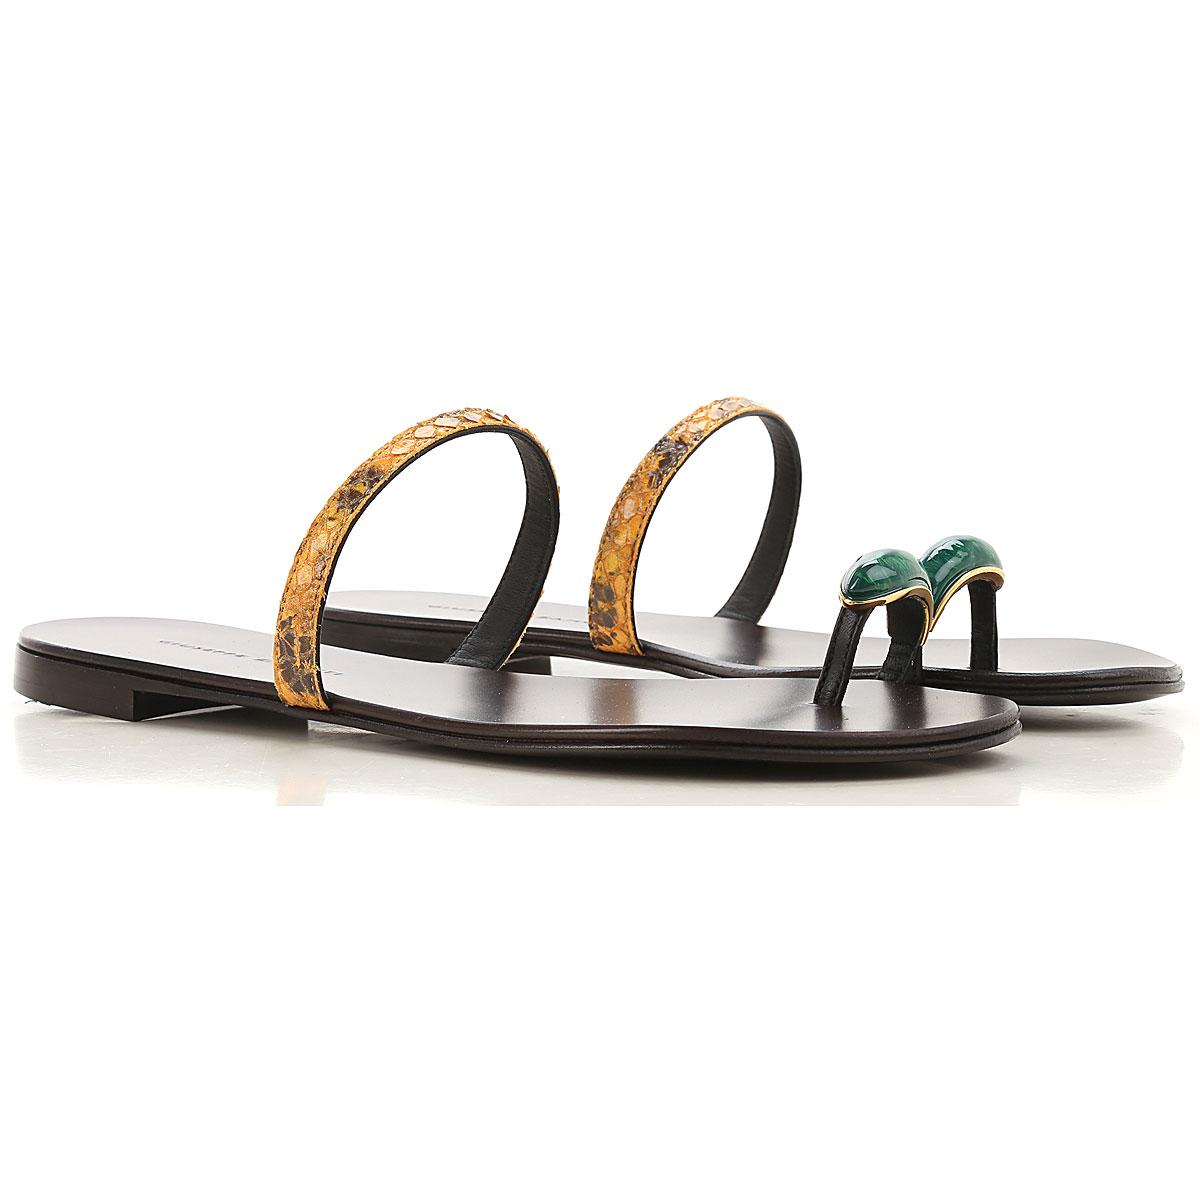 Giuseppe Zanotti Design Sandals for Women On Sale, Black, Leather, 2019, 6 8